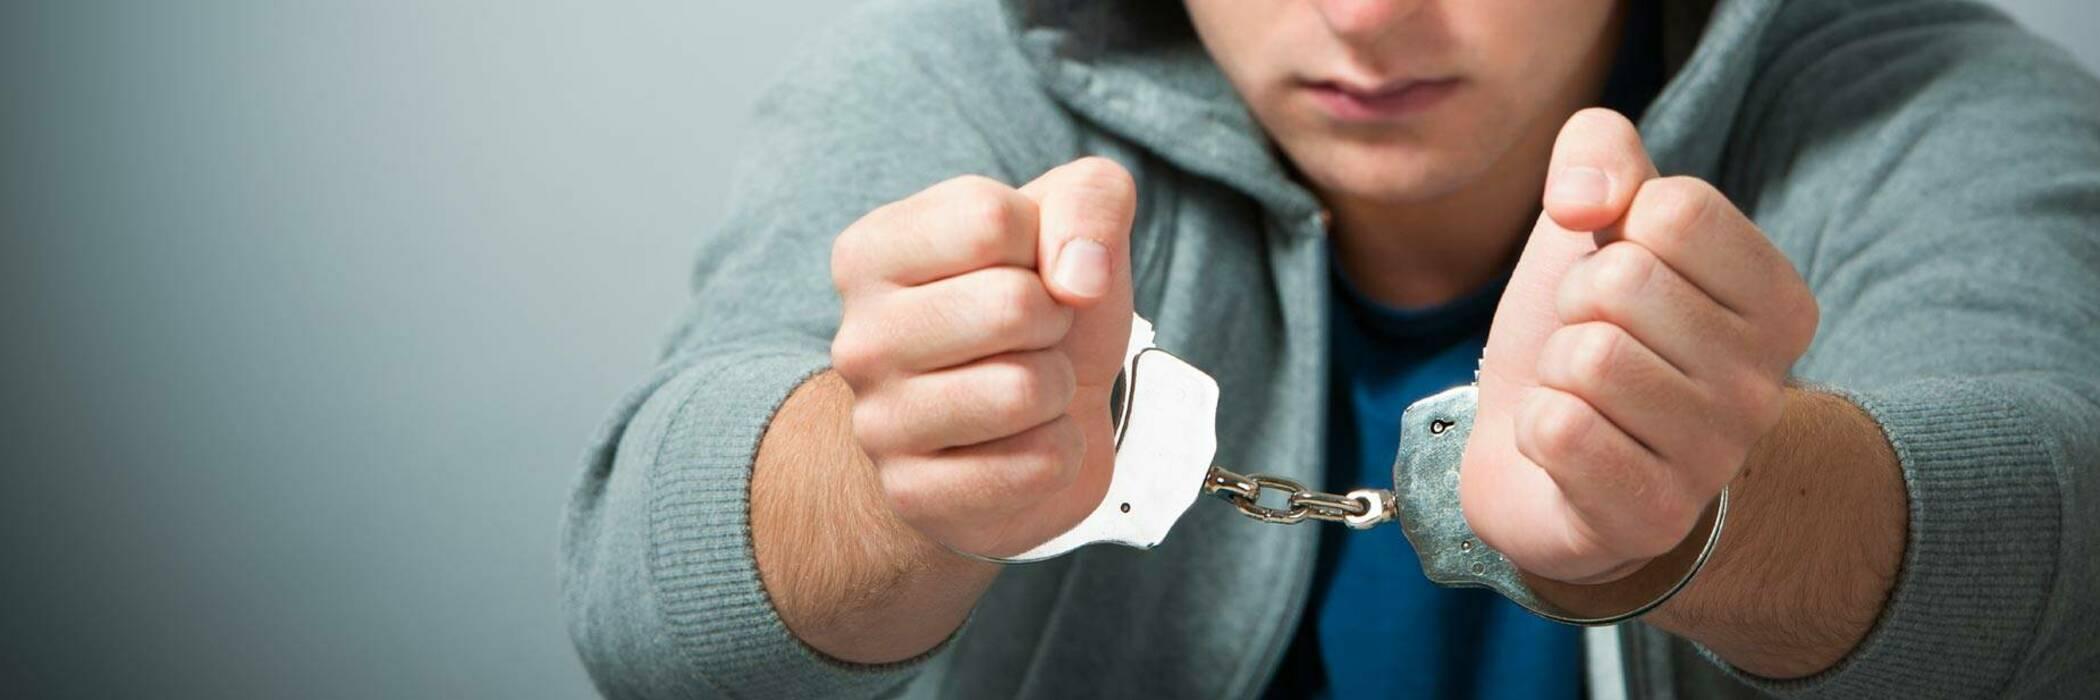 15june teenagers and police hero